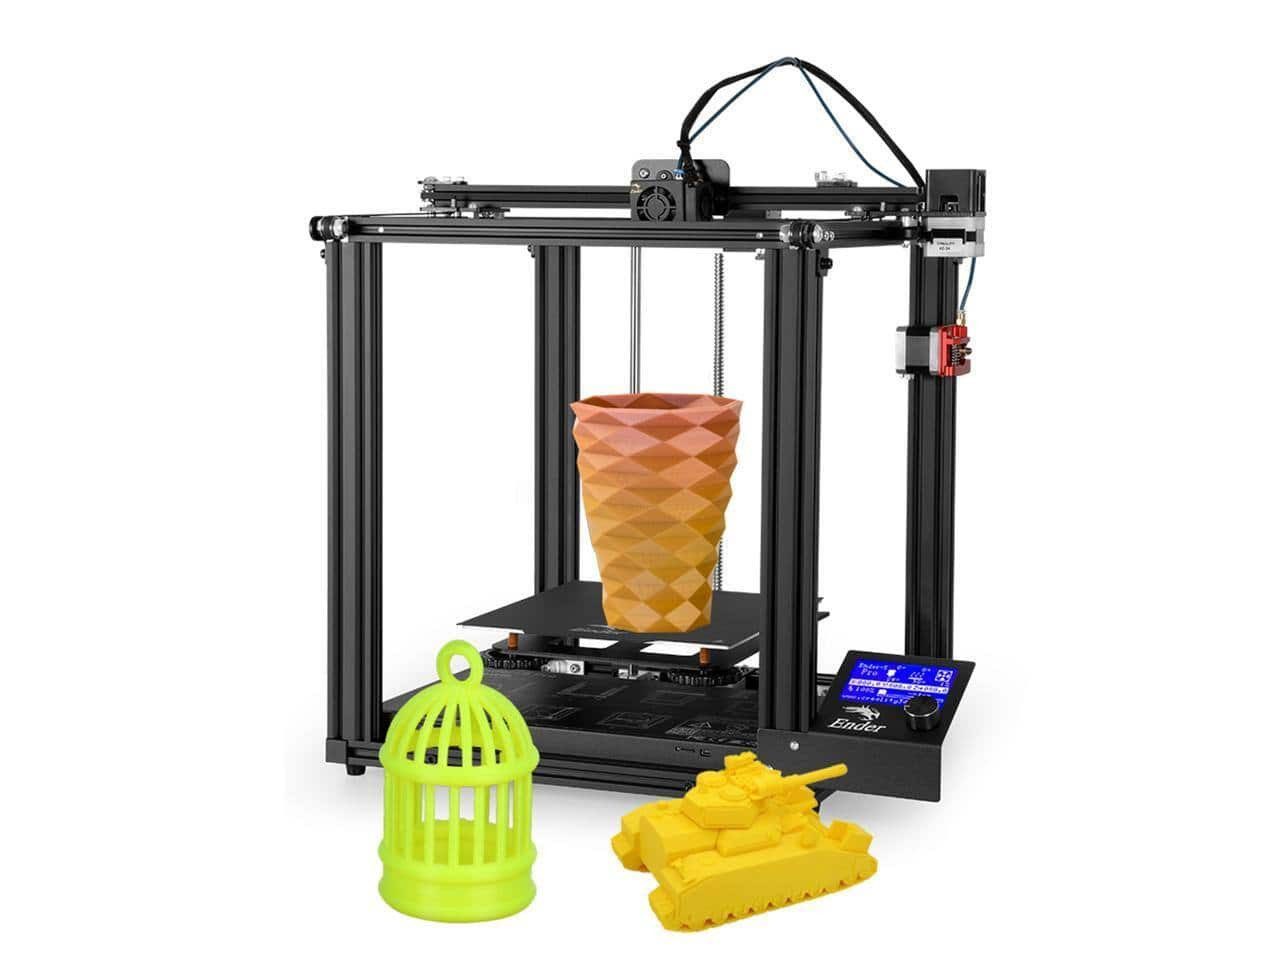 Creality 3D High Precision Ender-5 Pro 3D Printer DIY Kit for $345.99 w/ FS